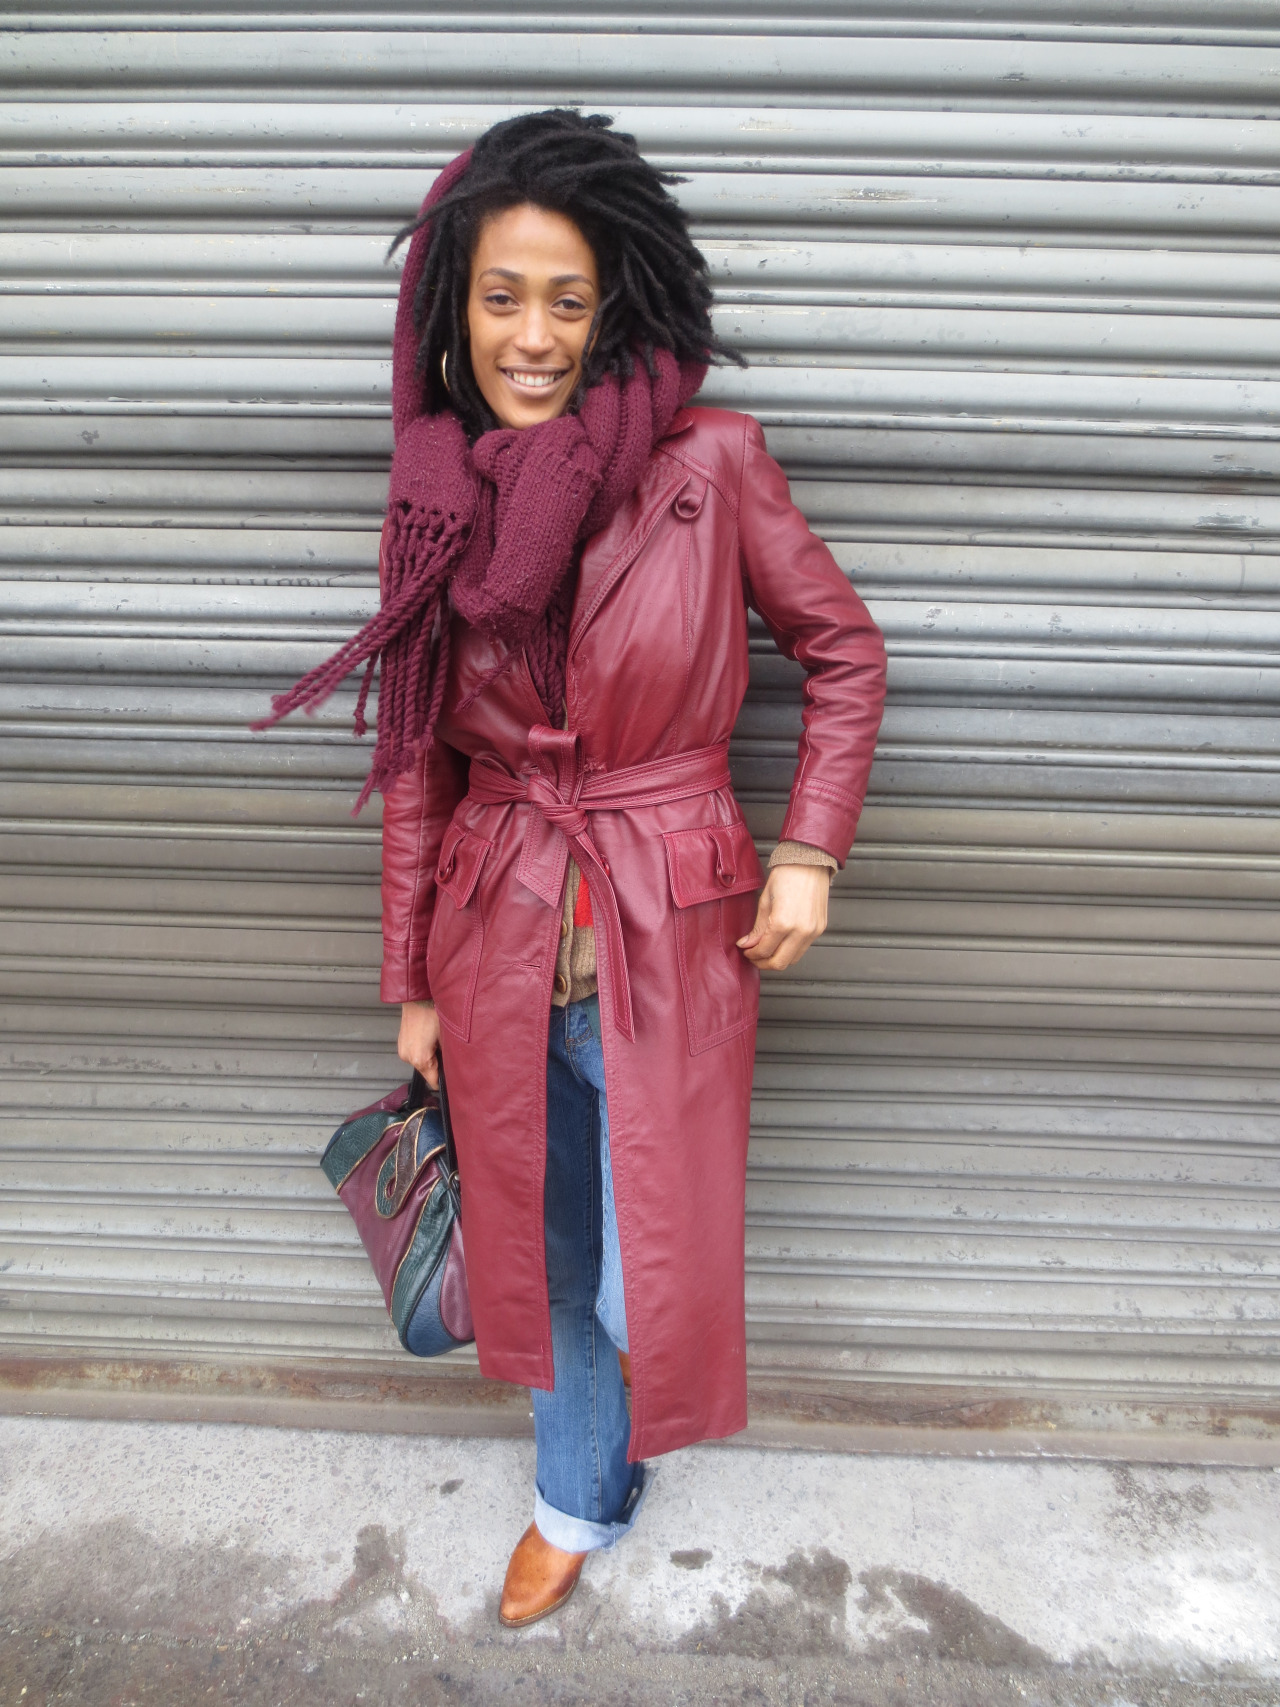 LOVE THIS LOOK!     blackfashion :     Lyfe Silva, Brooklyn, Vintage coat shoes and purse    http://ascension-lyfe.tumblr.com/   @Myelyfe (twitter)